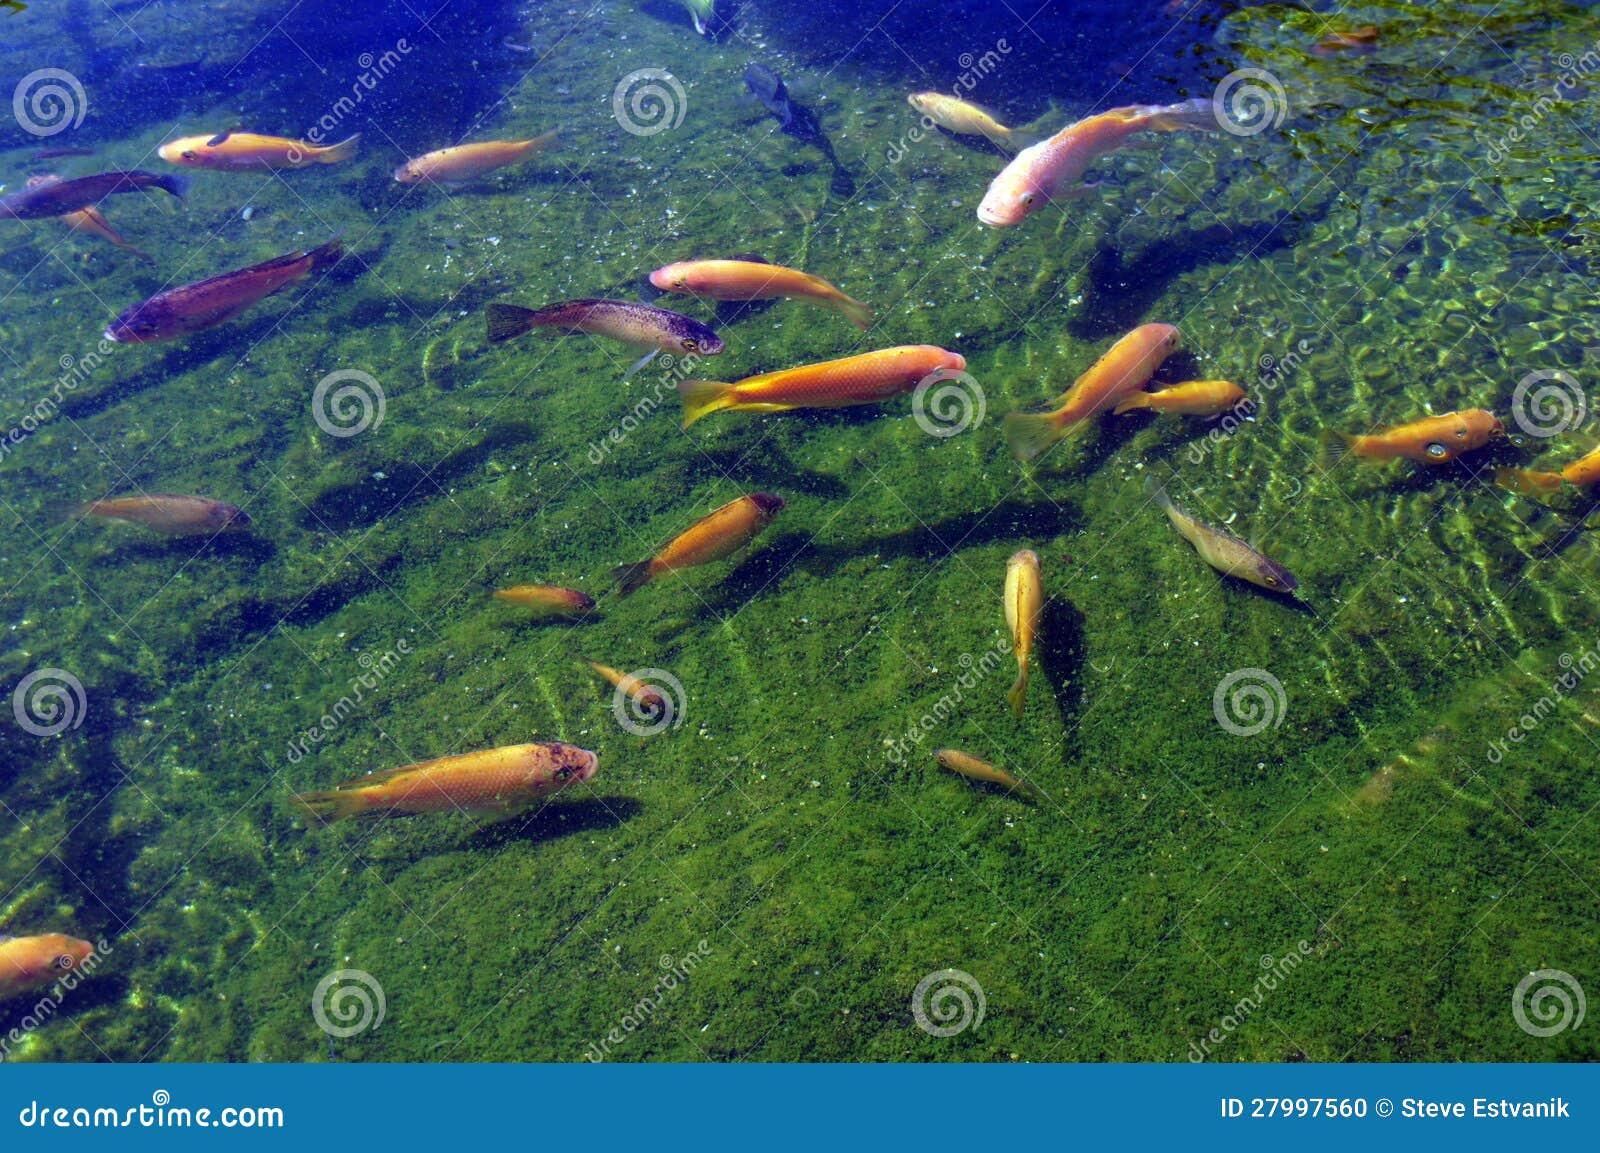 Koi carp swimming in shallow pool stock photo image for Koi carp pool design